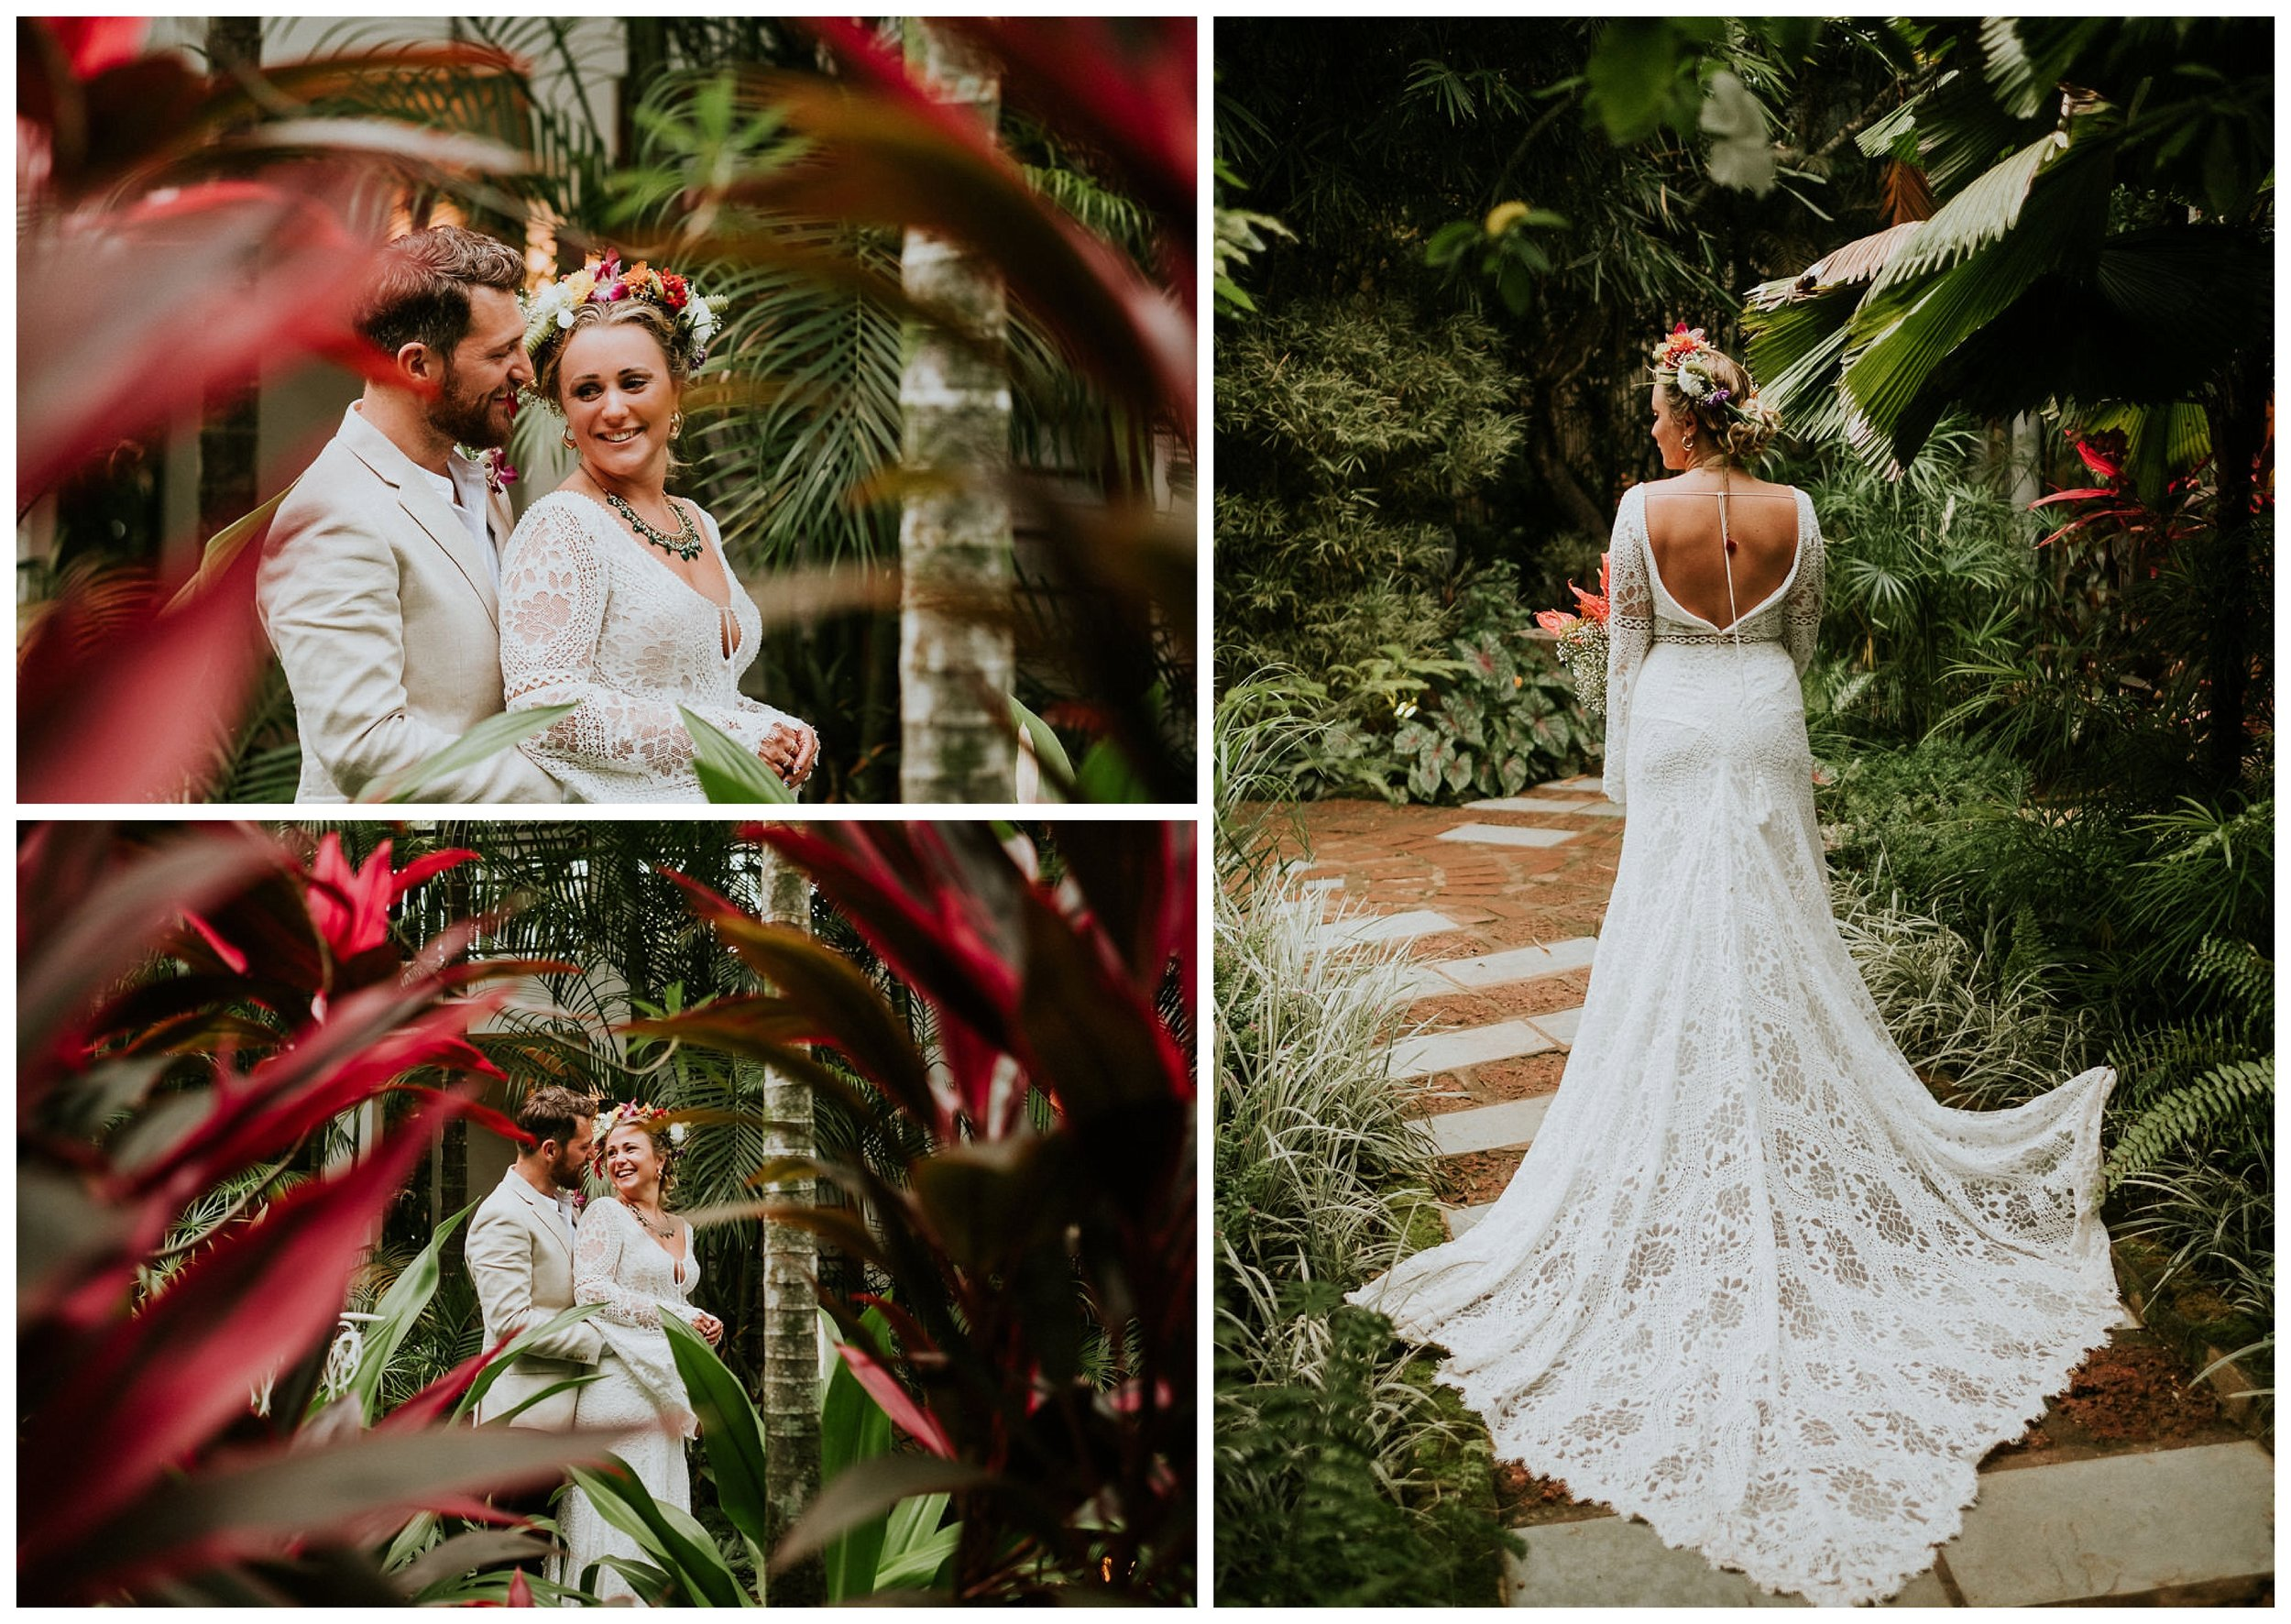 Goa Destination Wedding Photographer India Colouful Fun Joanna Nicole Photography Coco Shambhala20.jpg